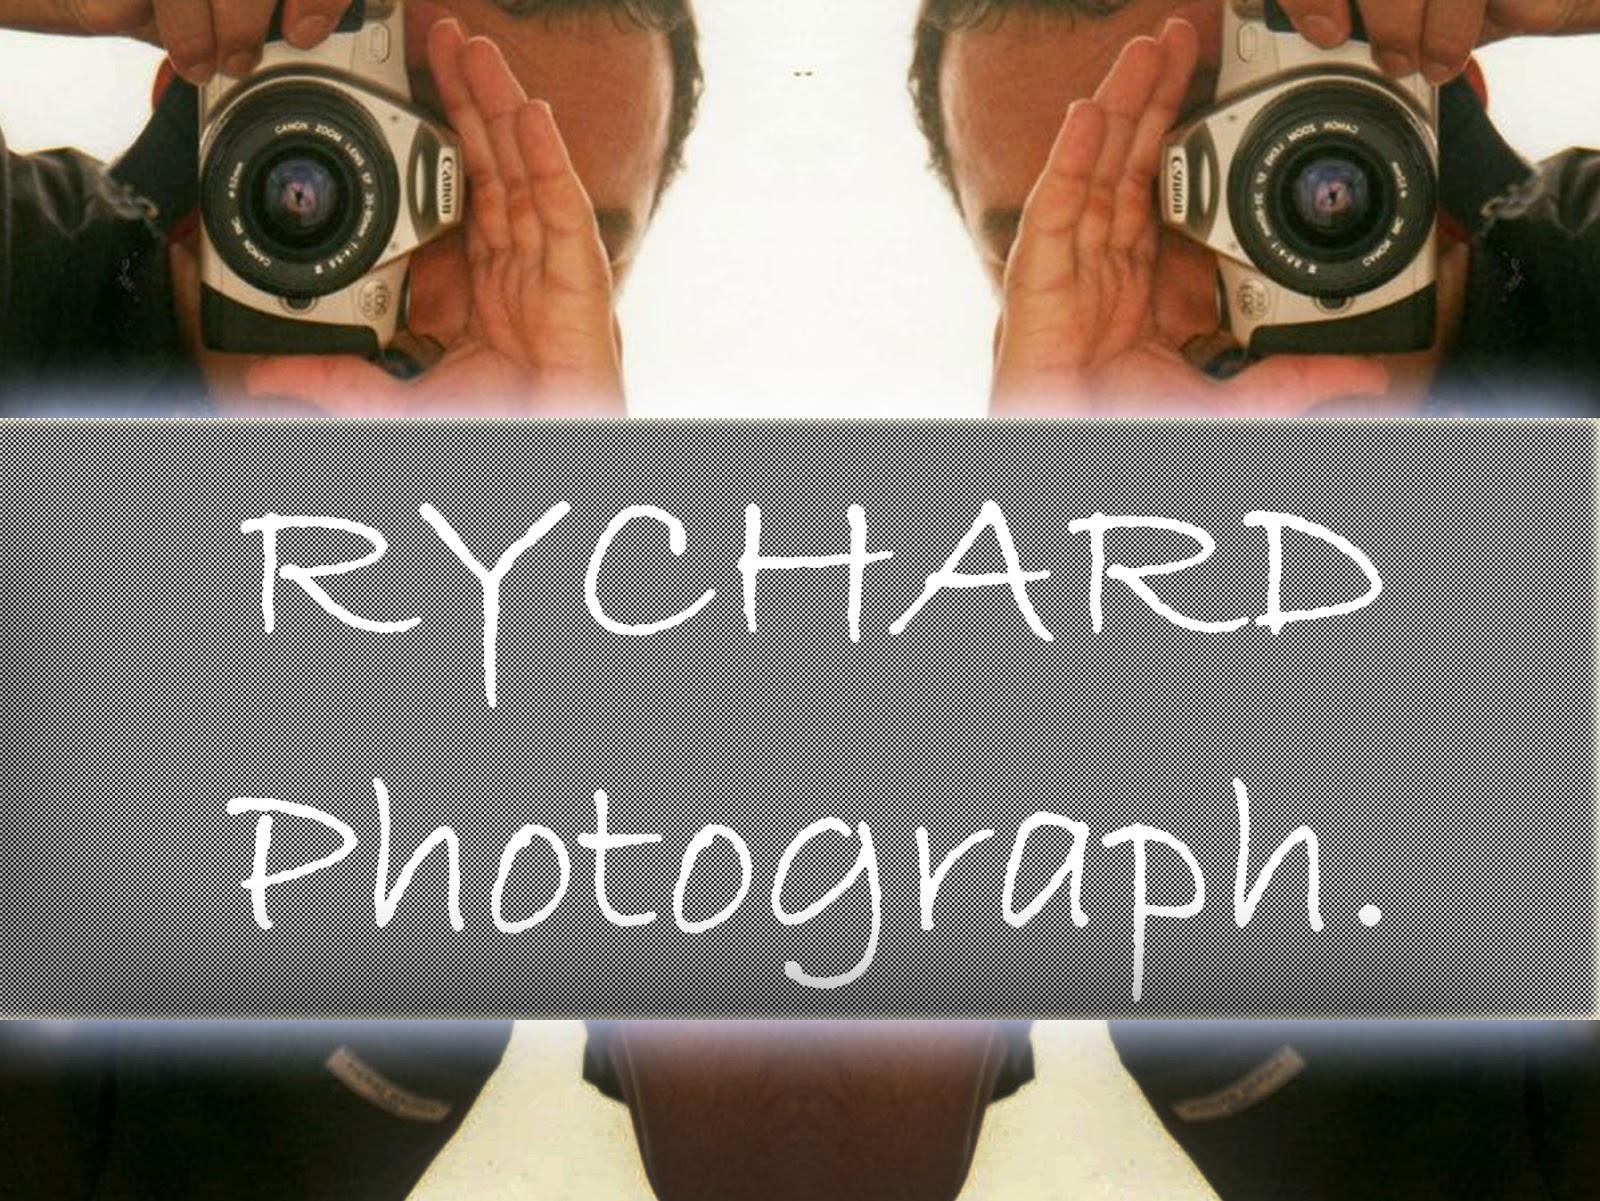 Richard Photograph